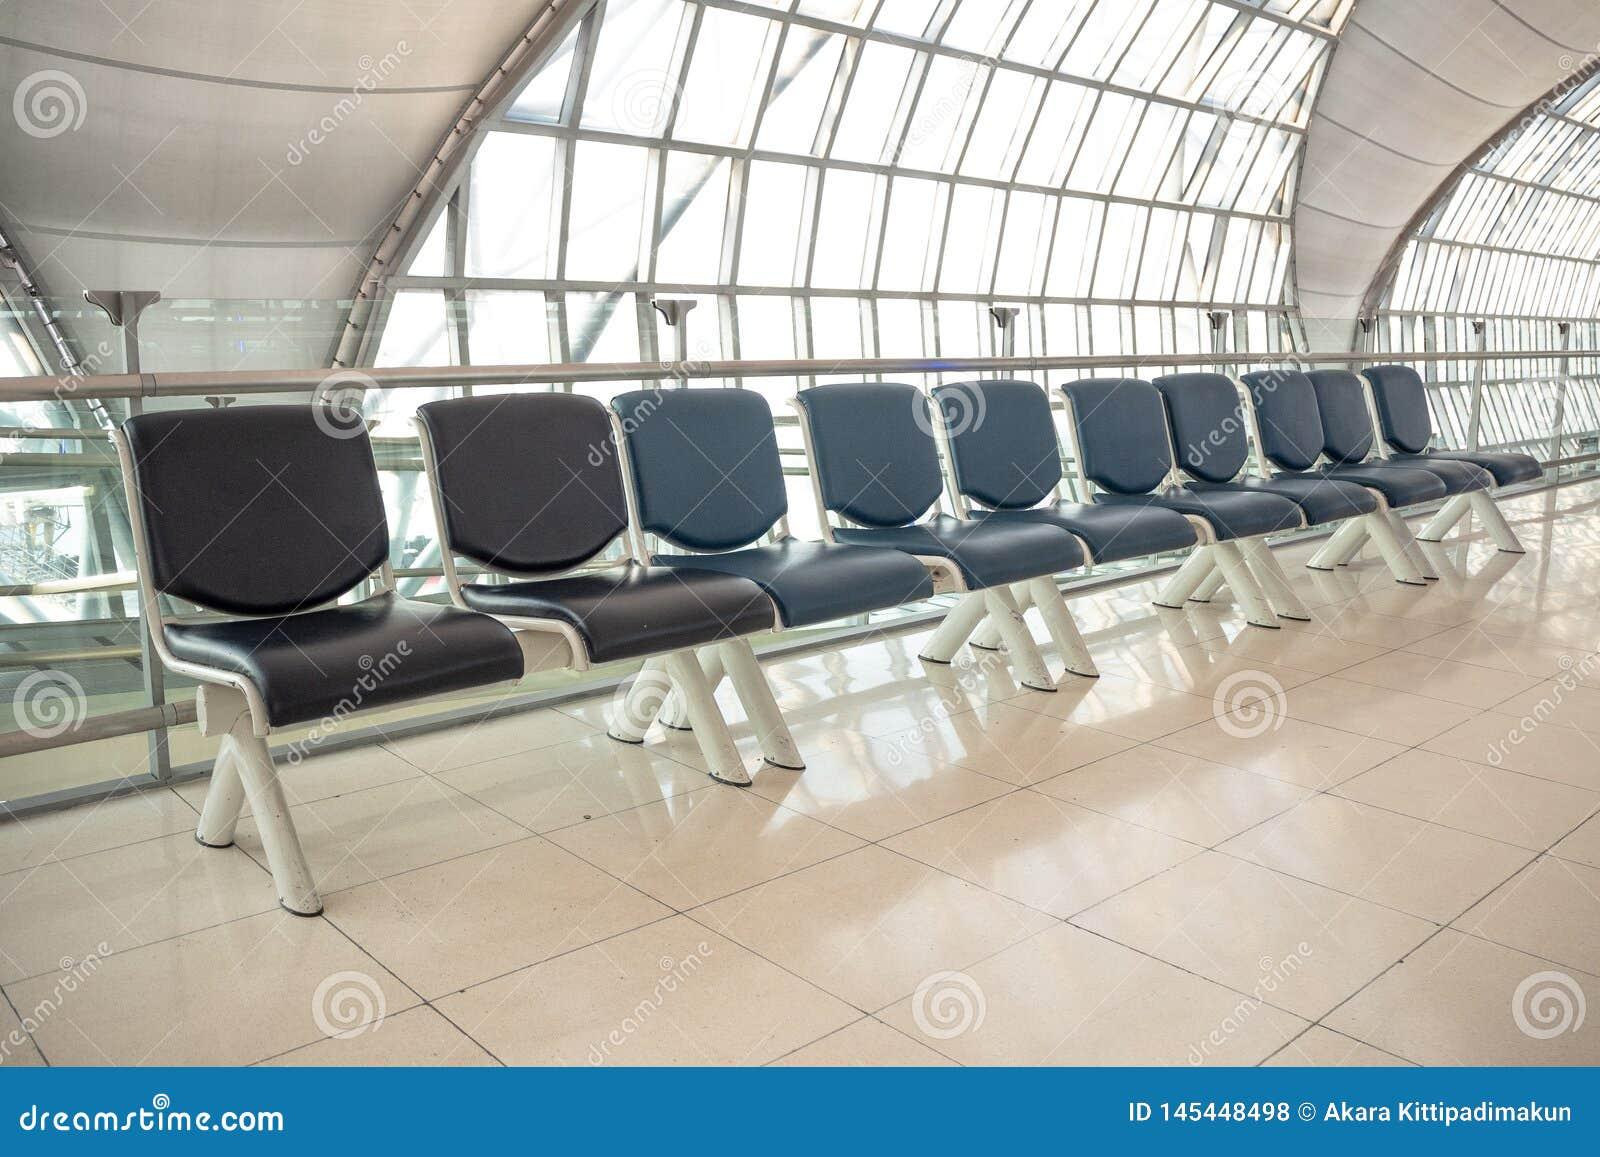 Пустая строка места для ожидания на воротах в аэропорте